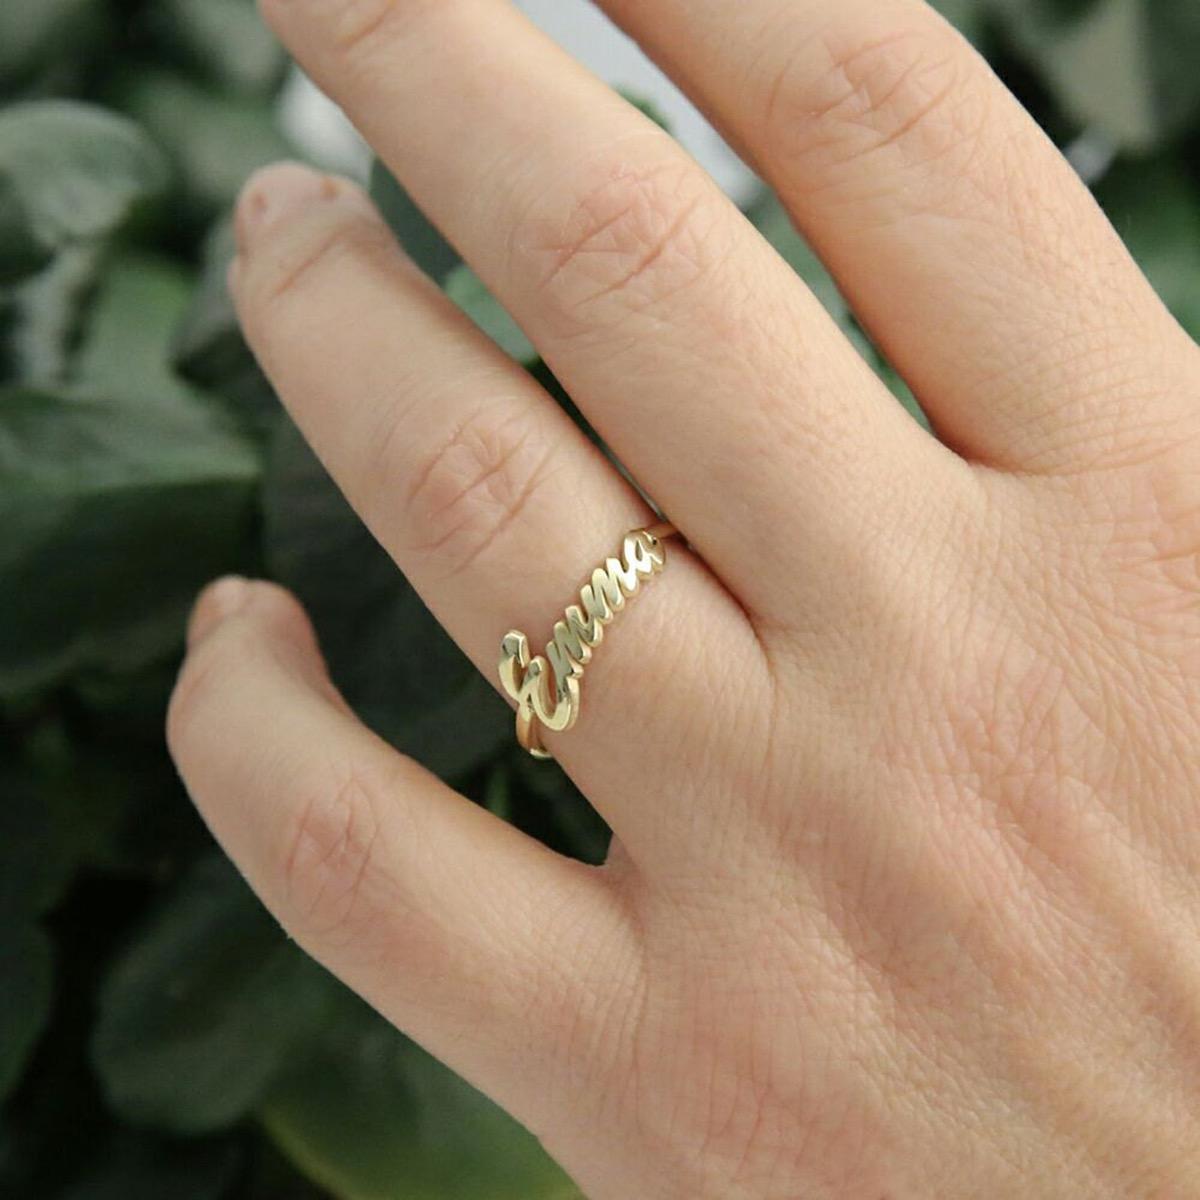 Woman's hans wearing script gold name ring